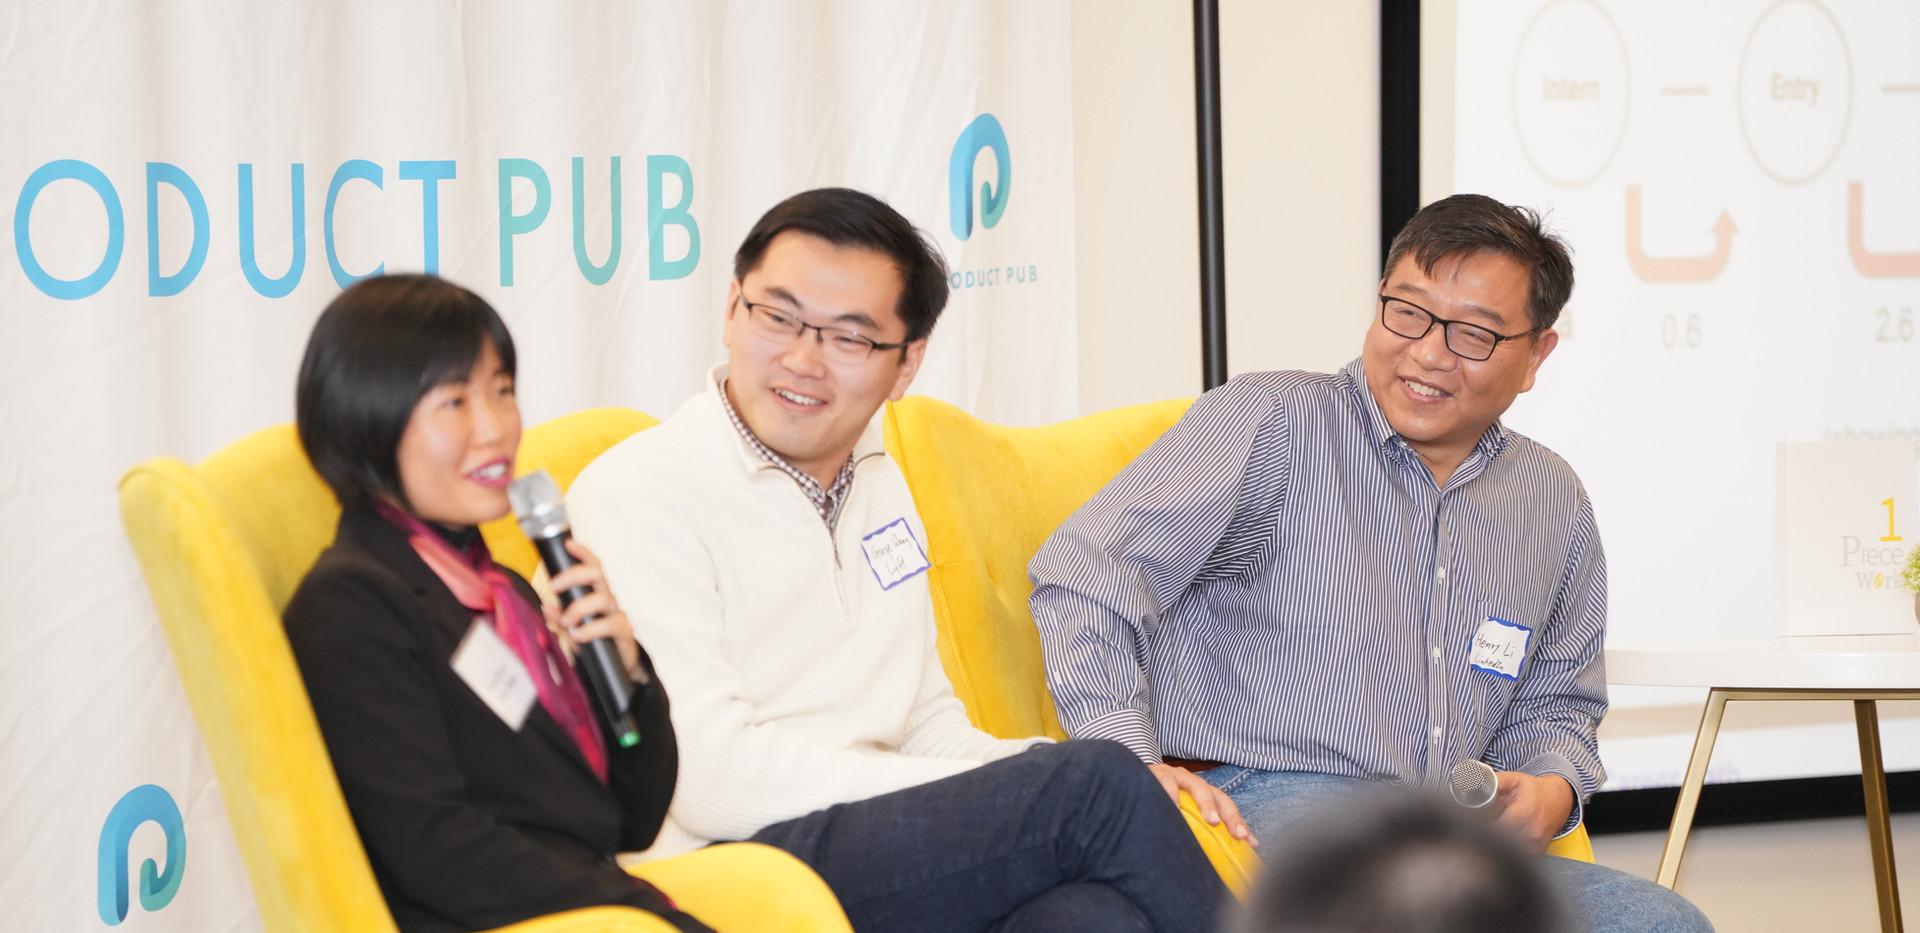 Product-Pub-Summit-2018-8